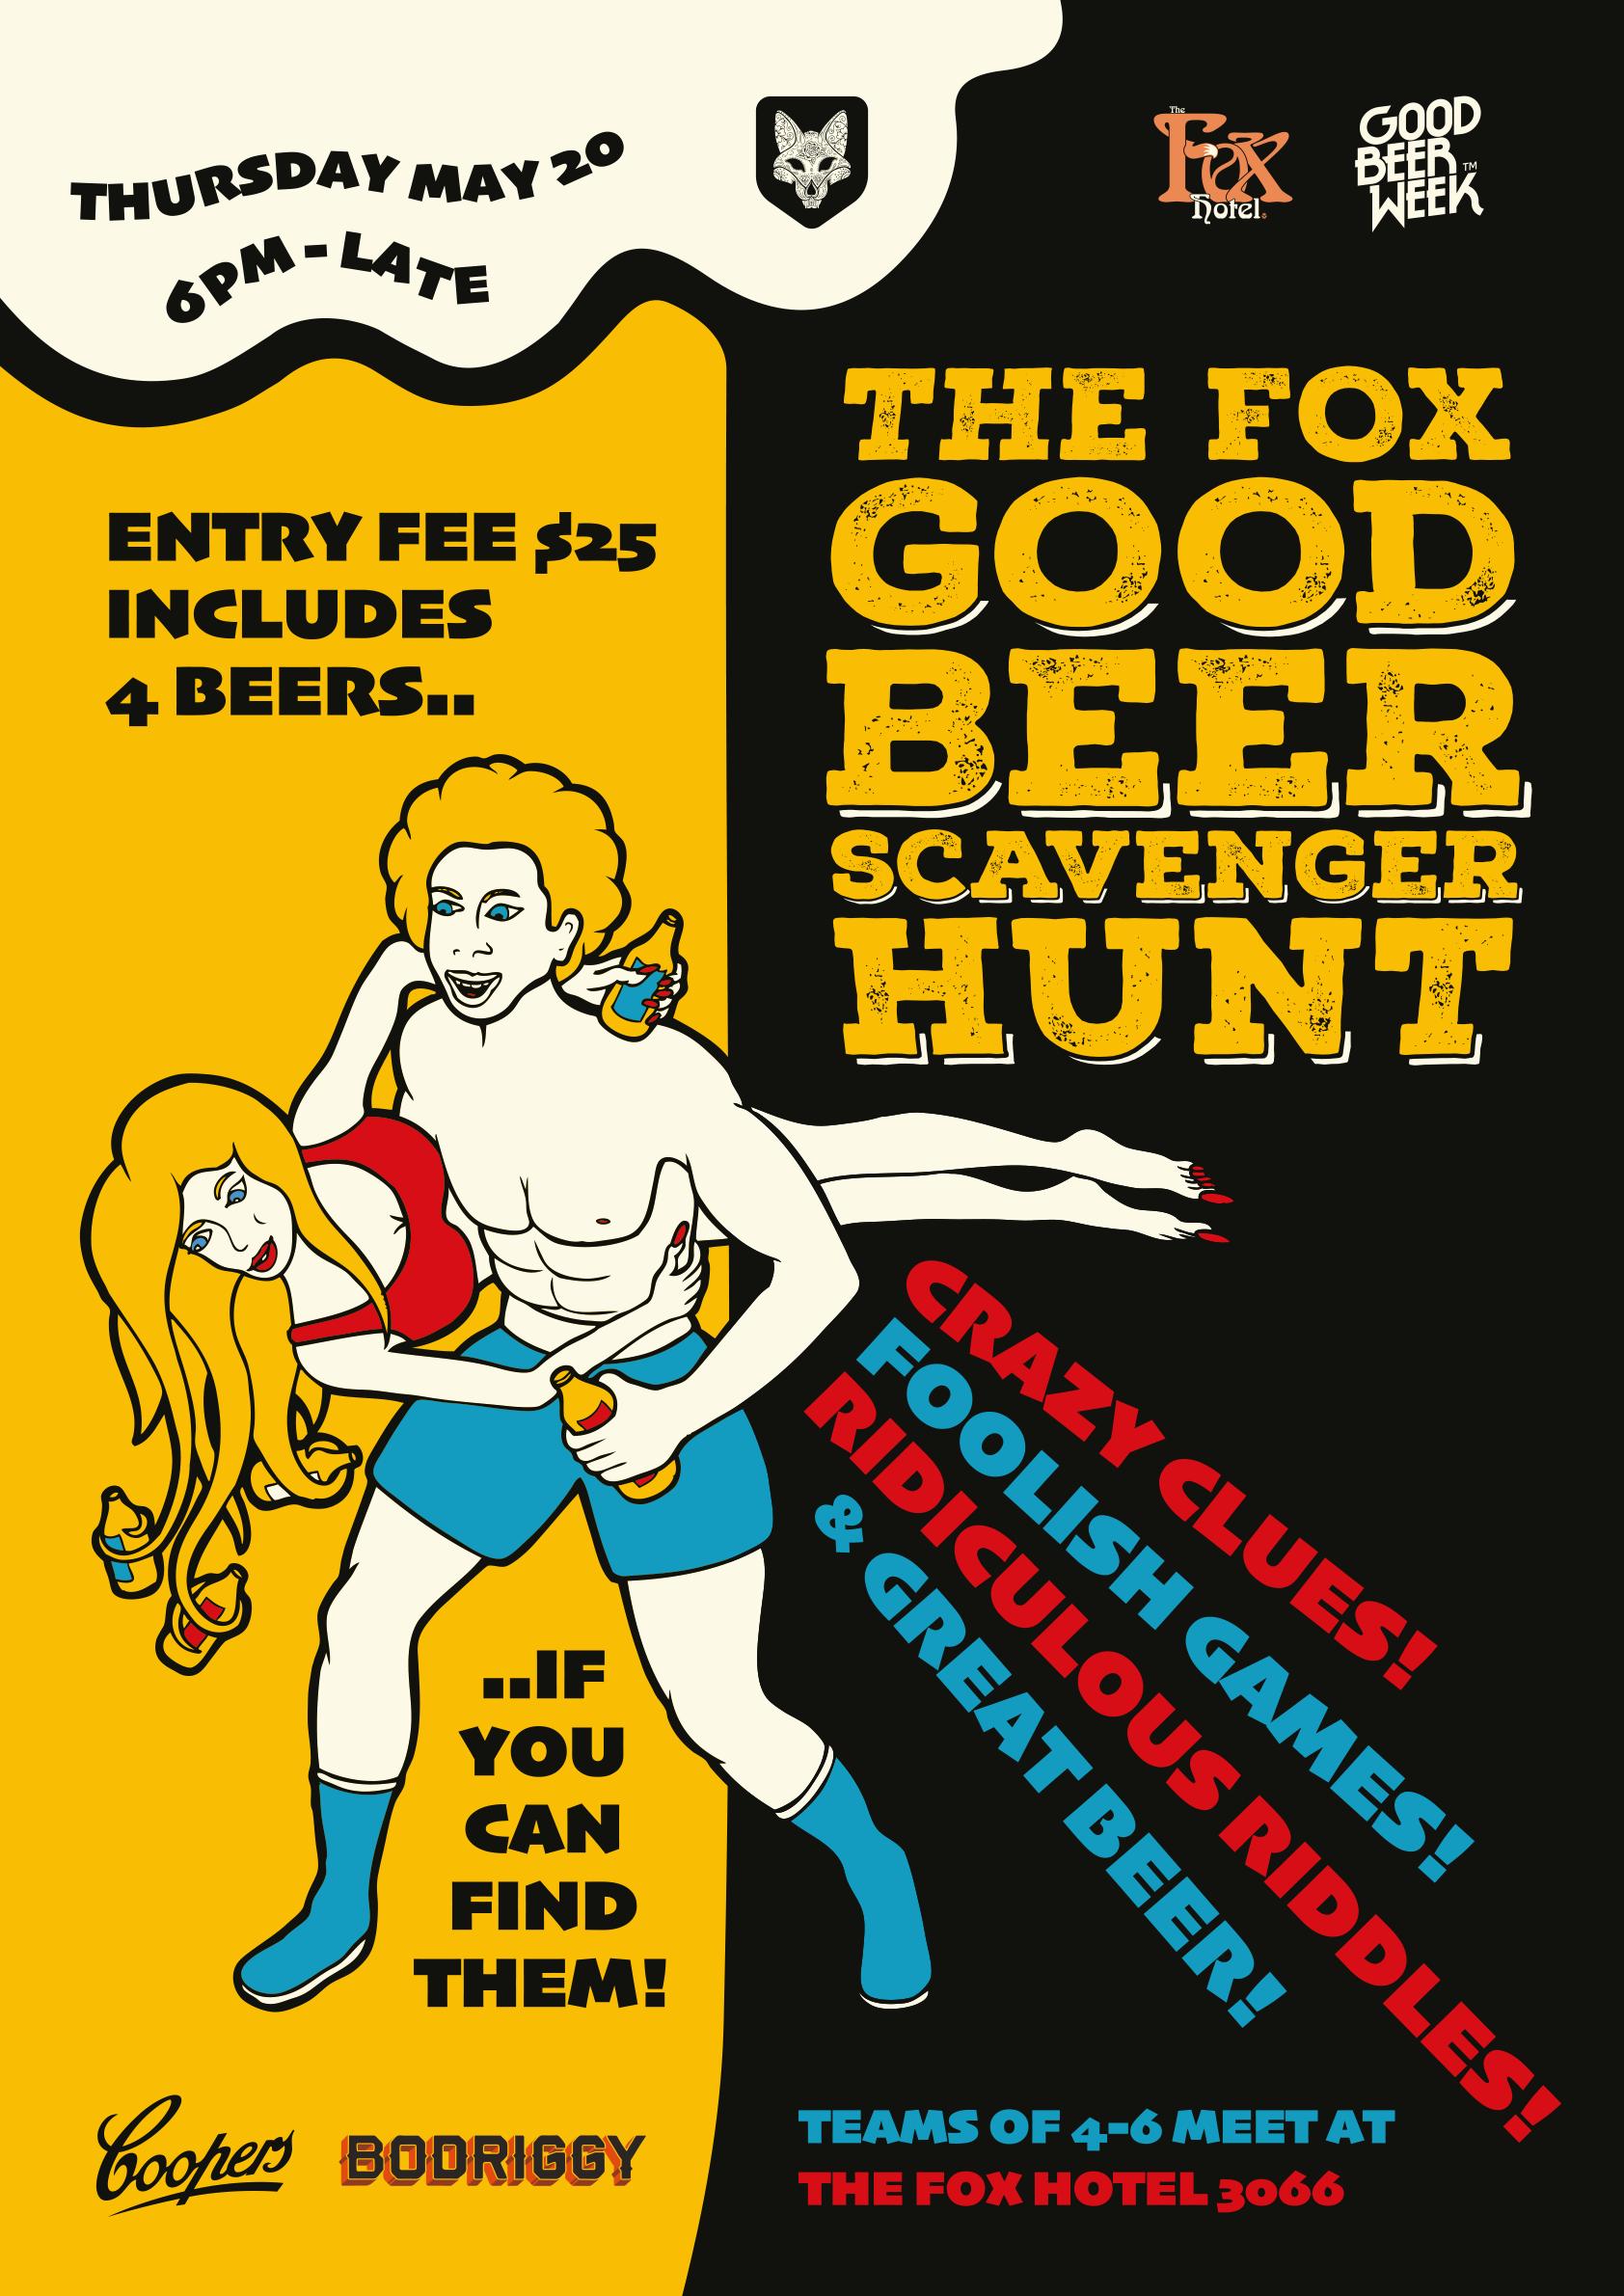 The Fox Hotel, Good Beer Week - Good Beer Scavenger Hunt